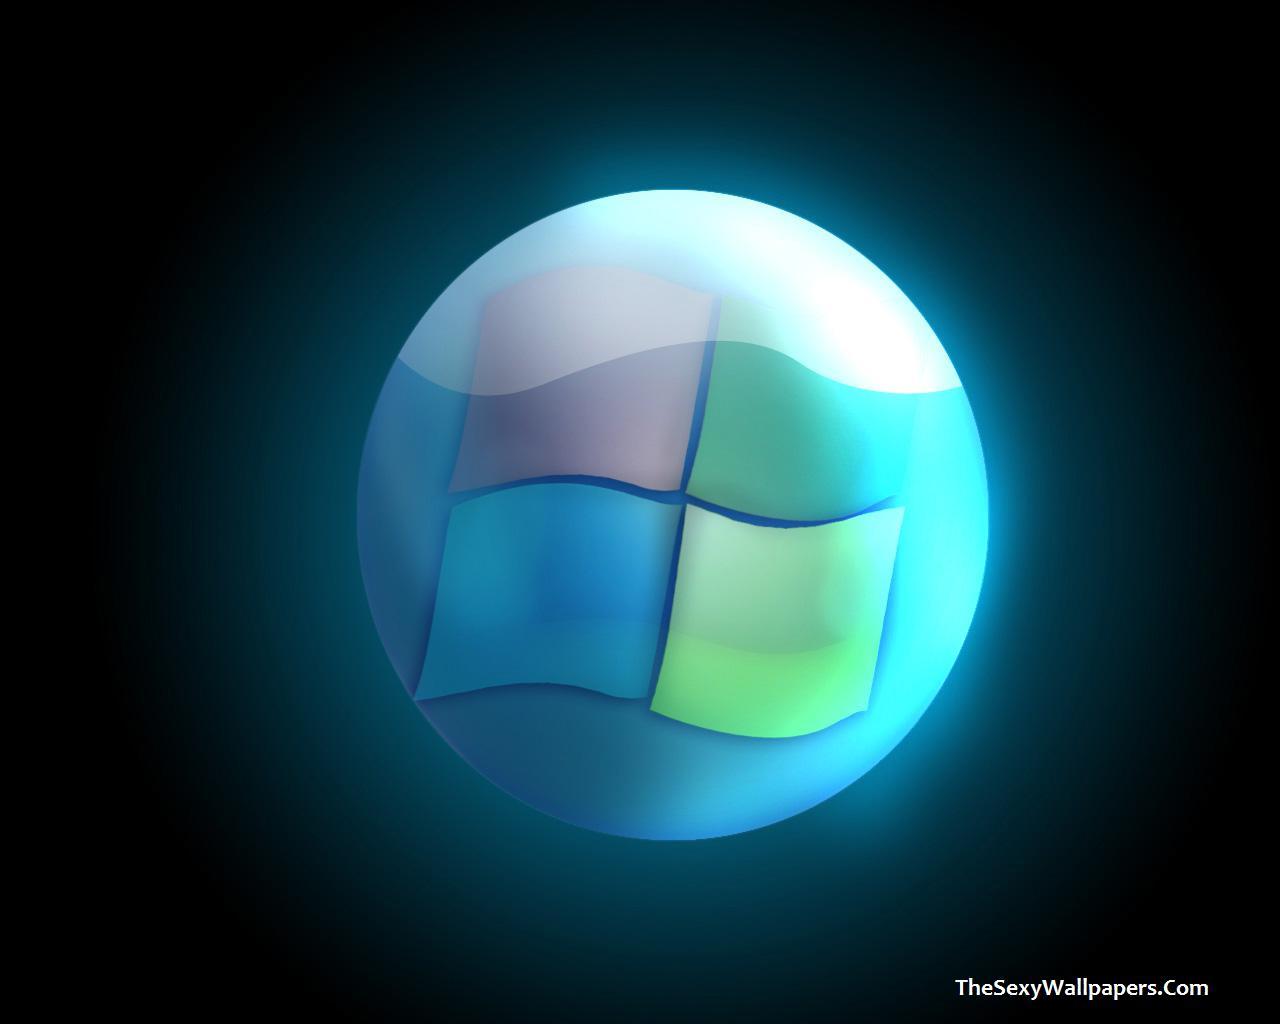 Wallpaper download microsoft - Free Download Microsoft Windows Wallpaper Windows Vista